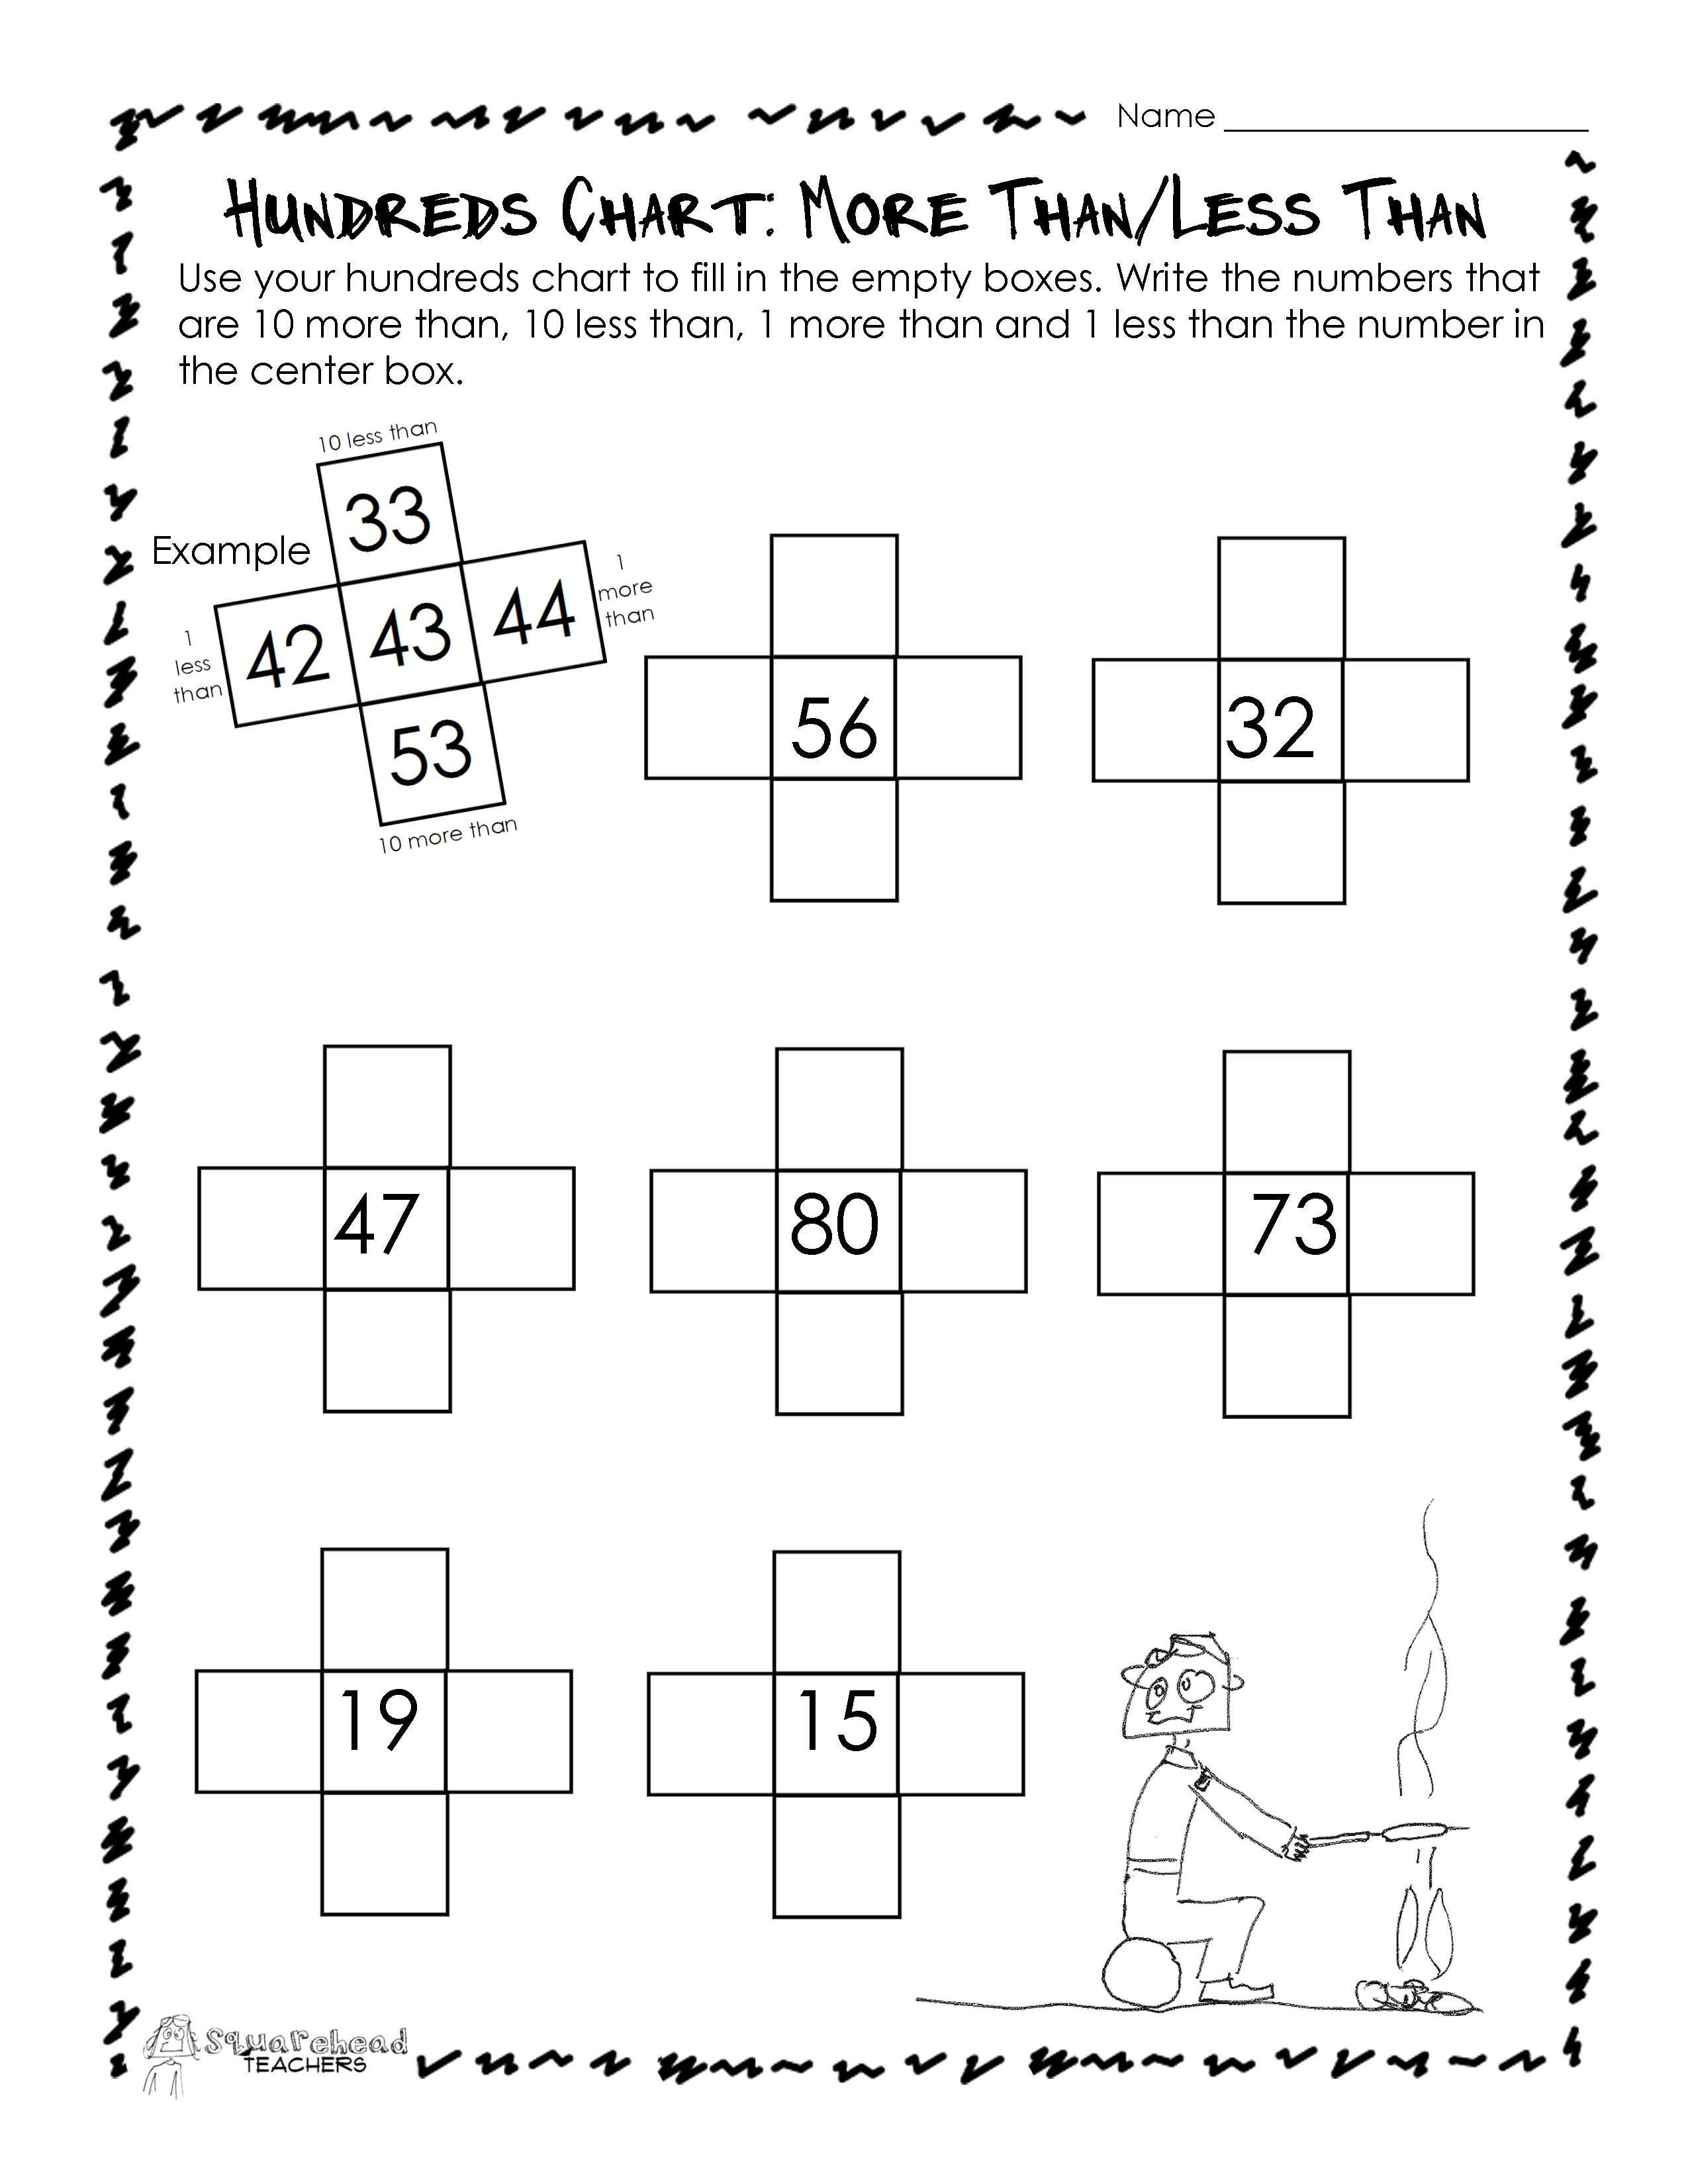 worksheet 10 More 10 Less Worksheets worksheets with 10 more and less worksheet davezan